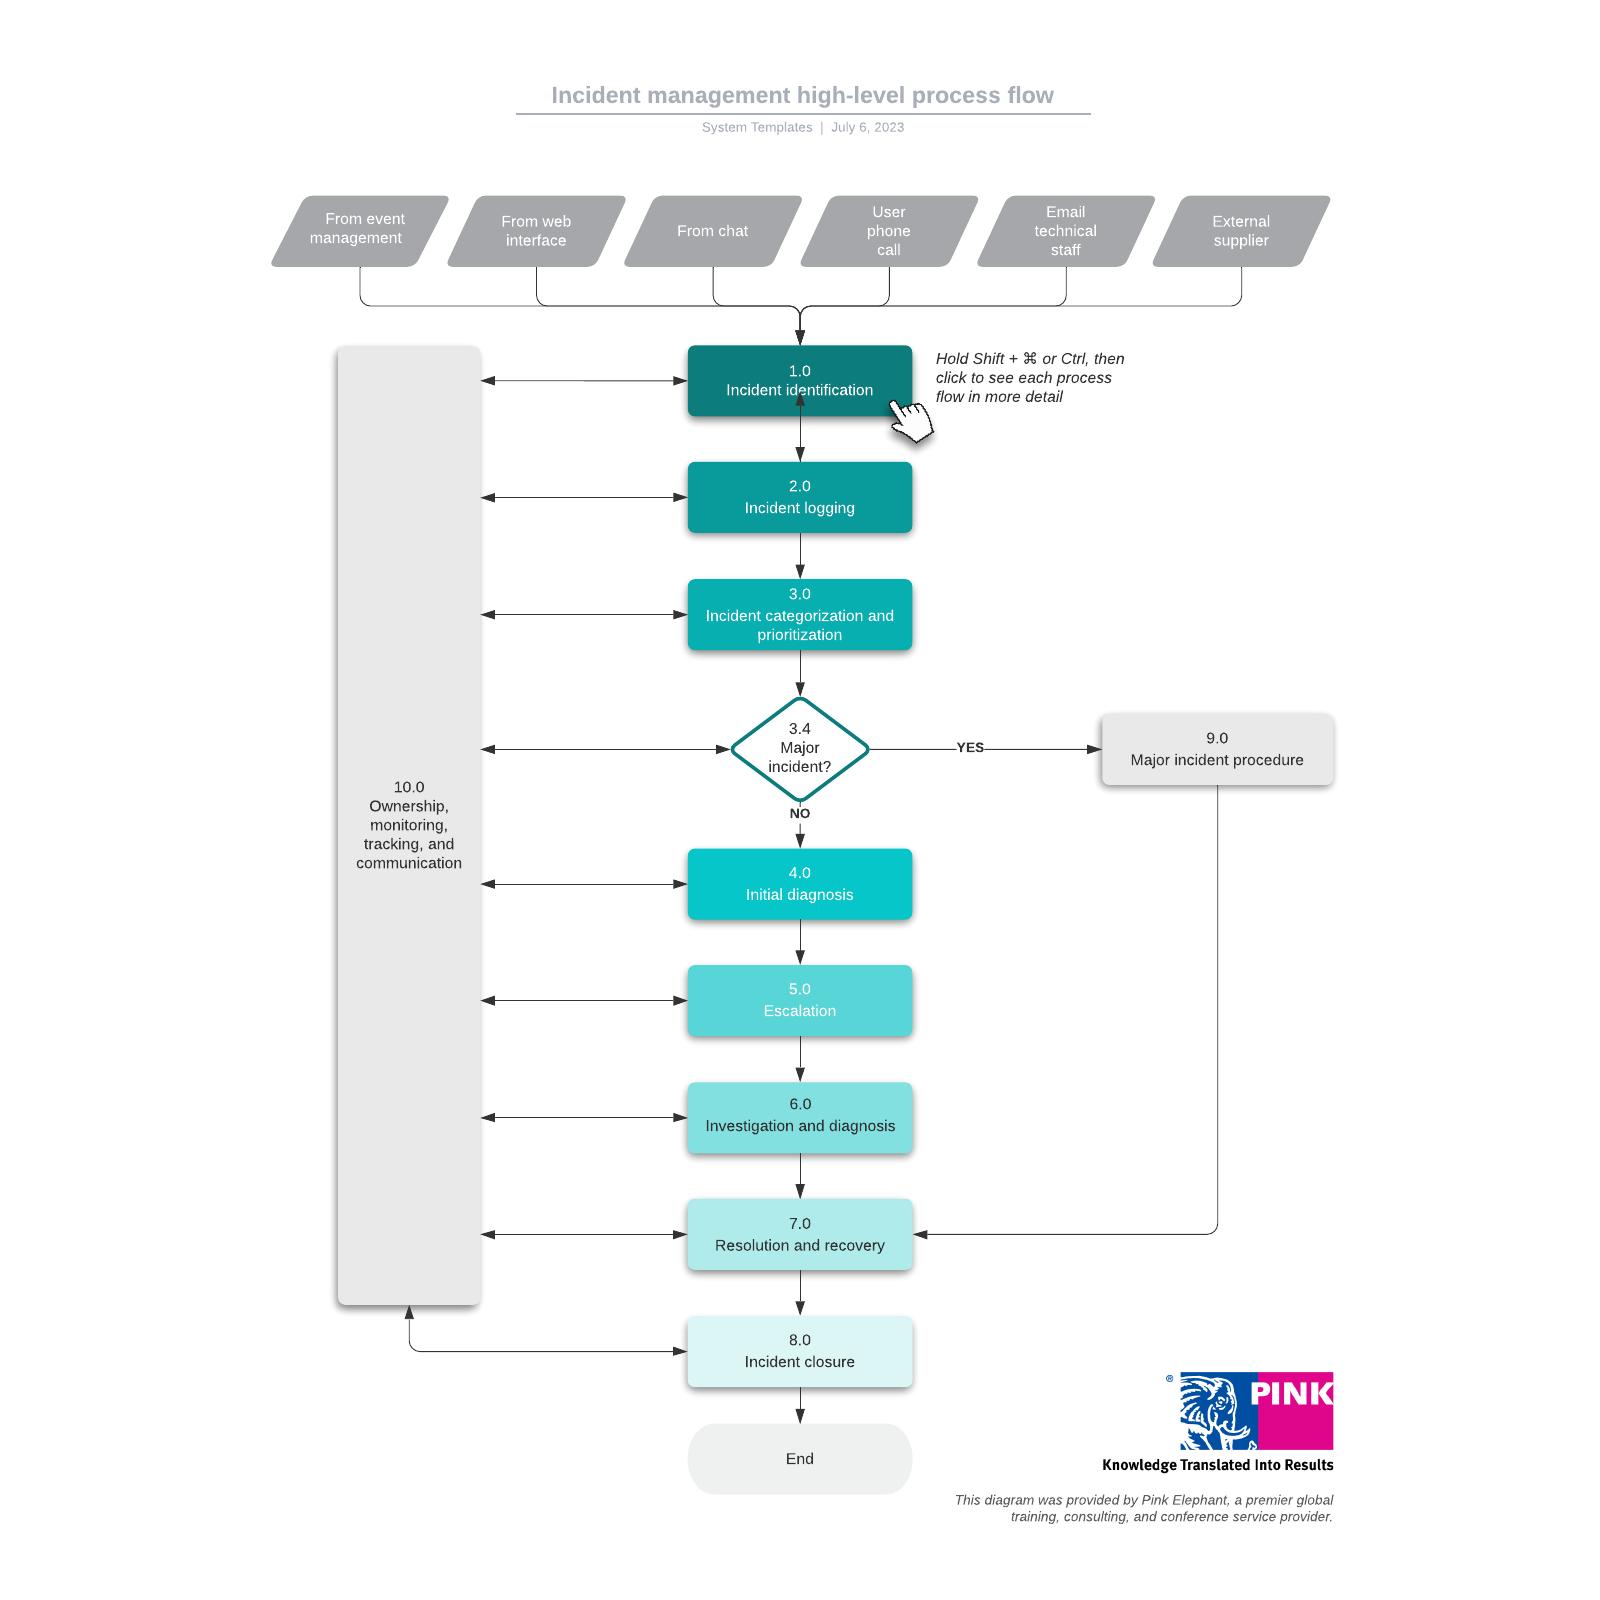 Incident management high-level process flow